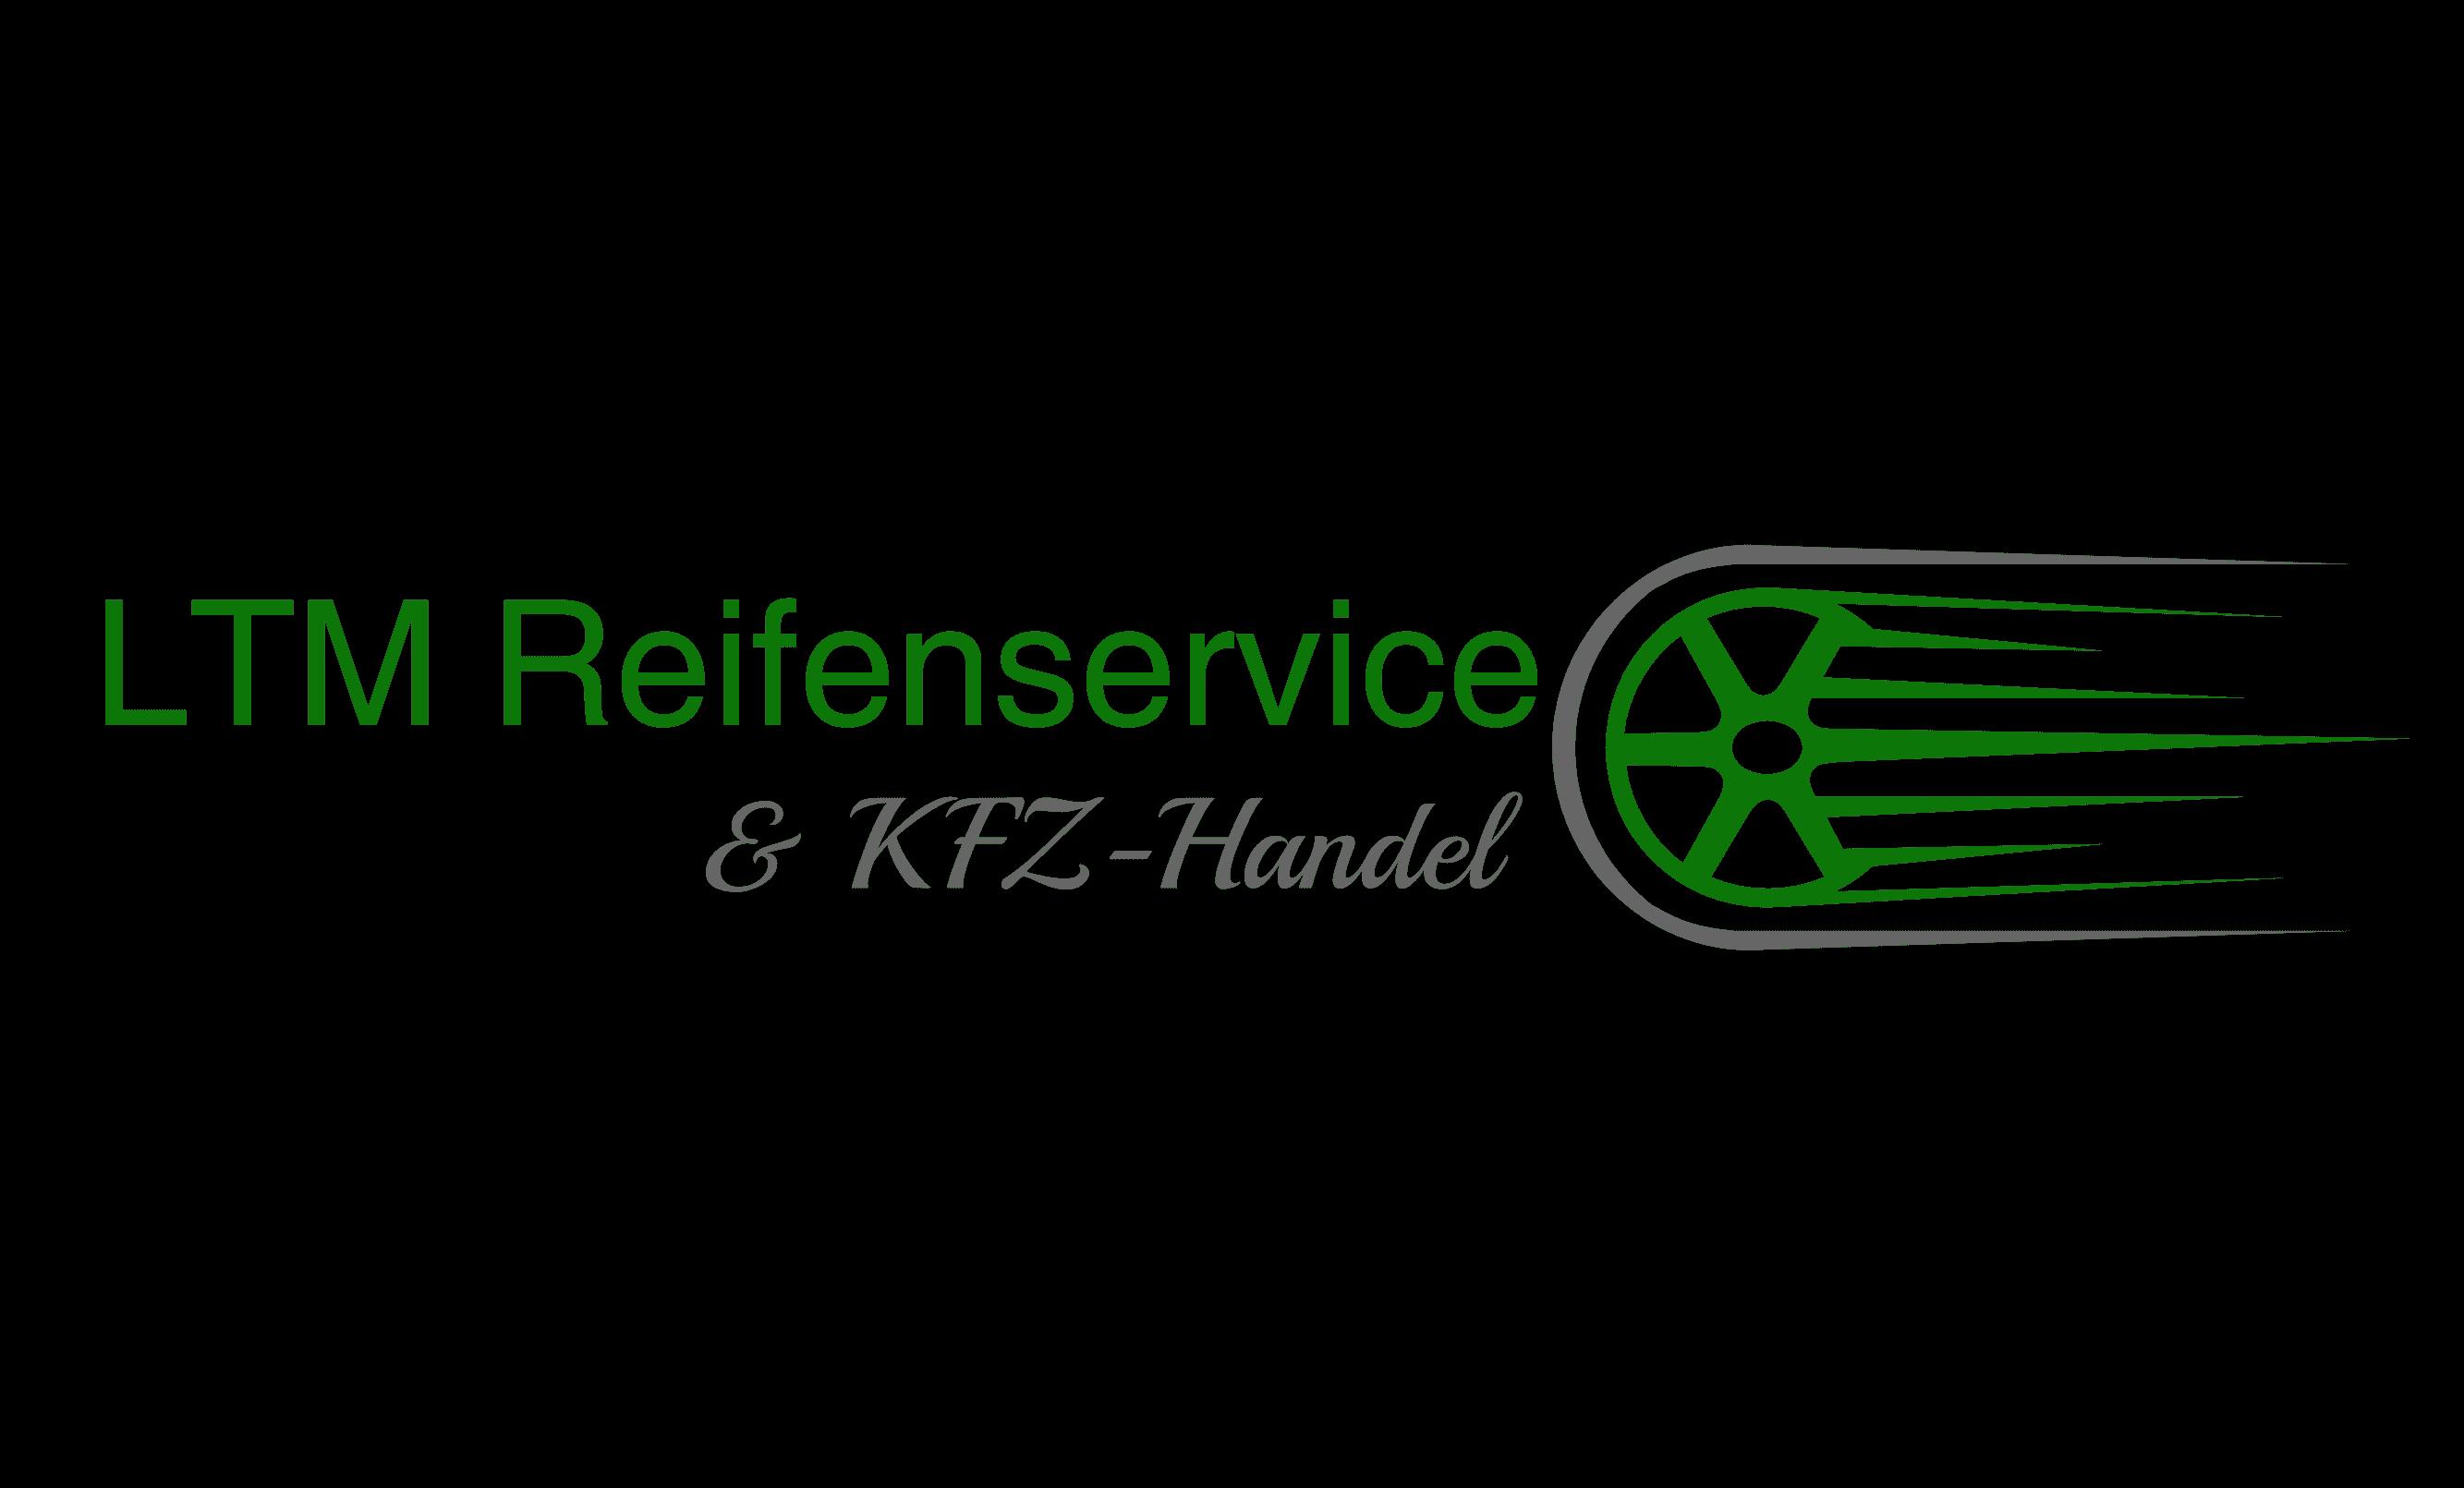 LTM Reifenservice & KFZ-Handel